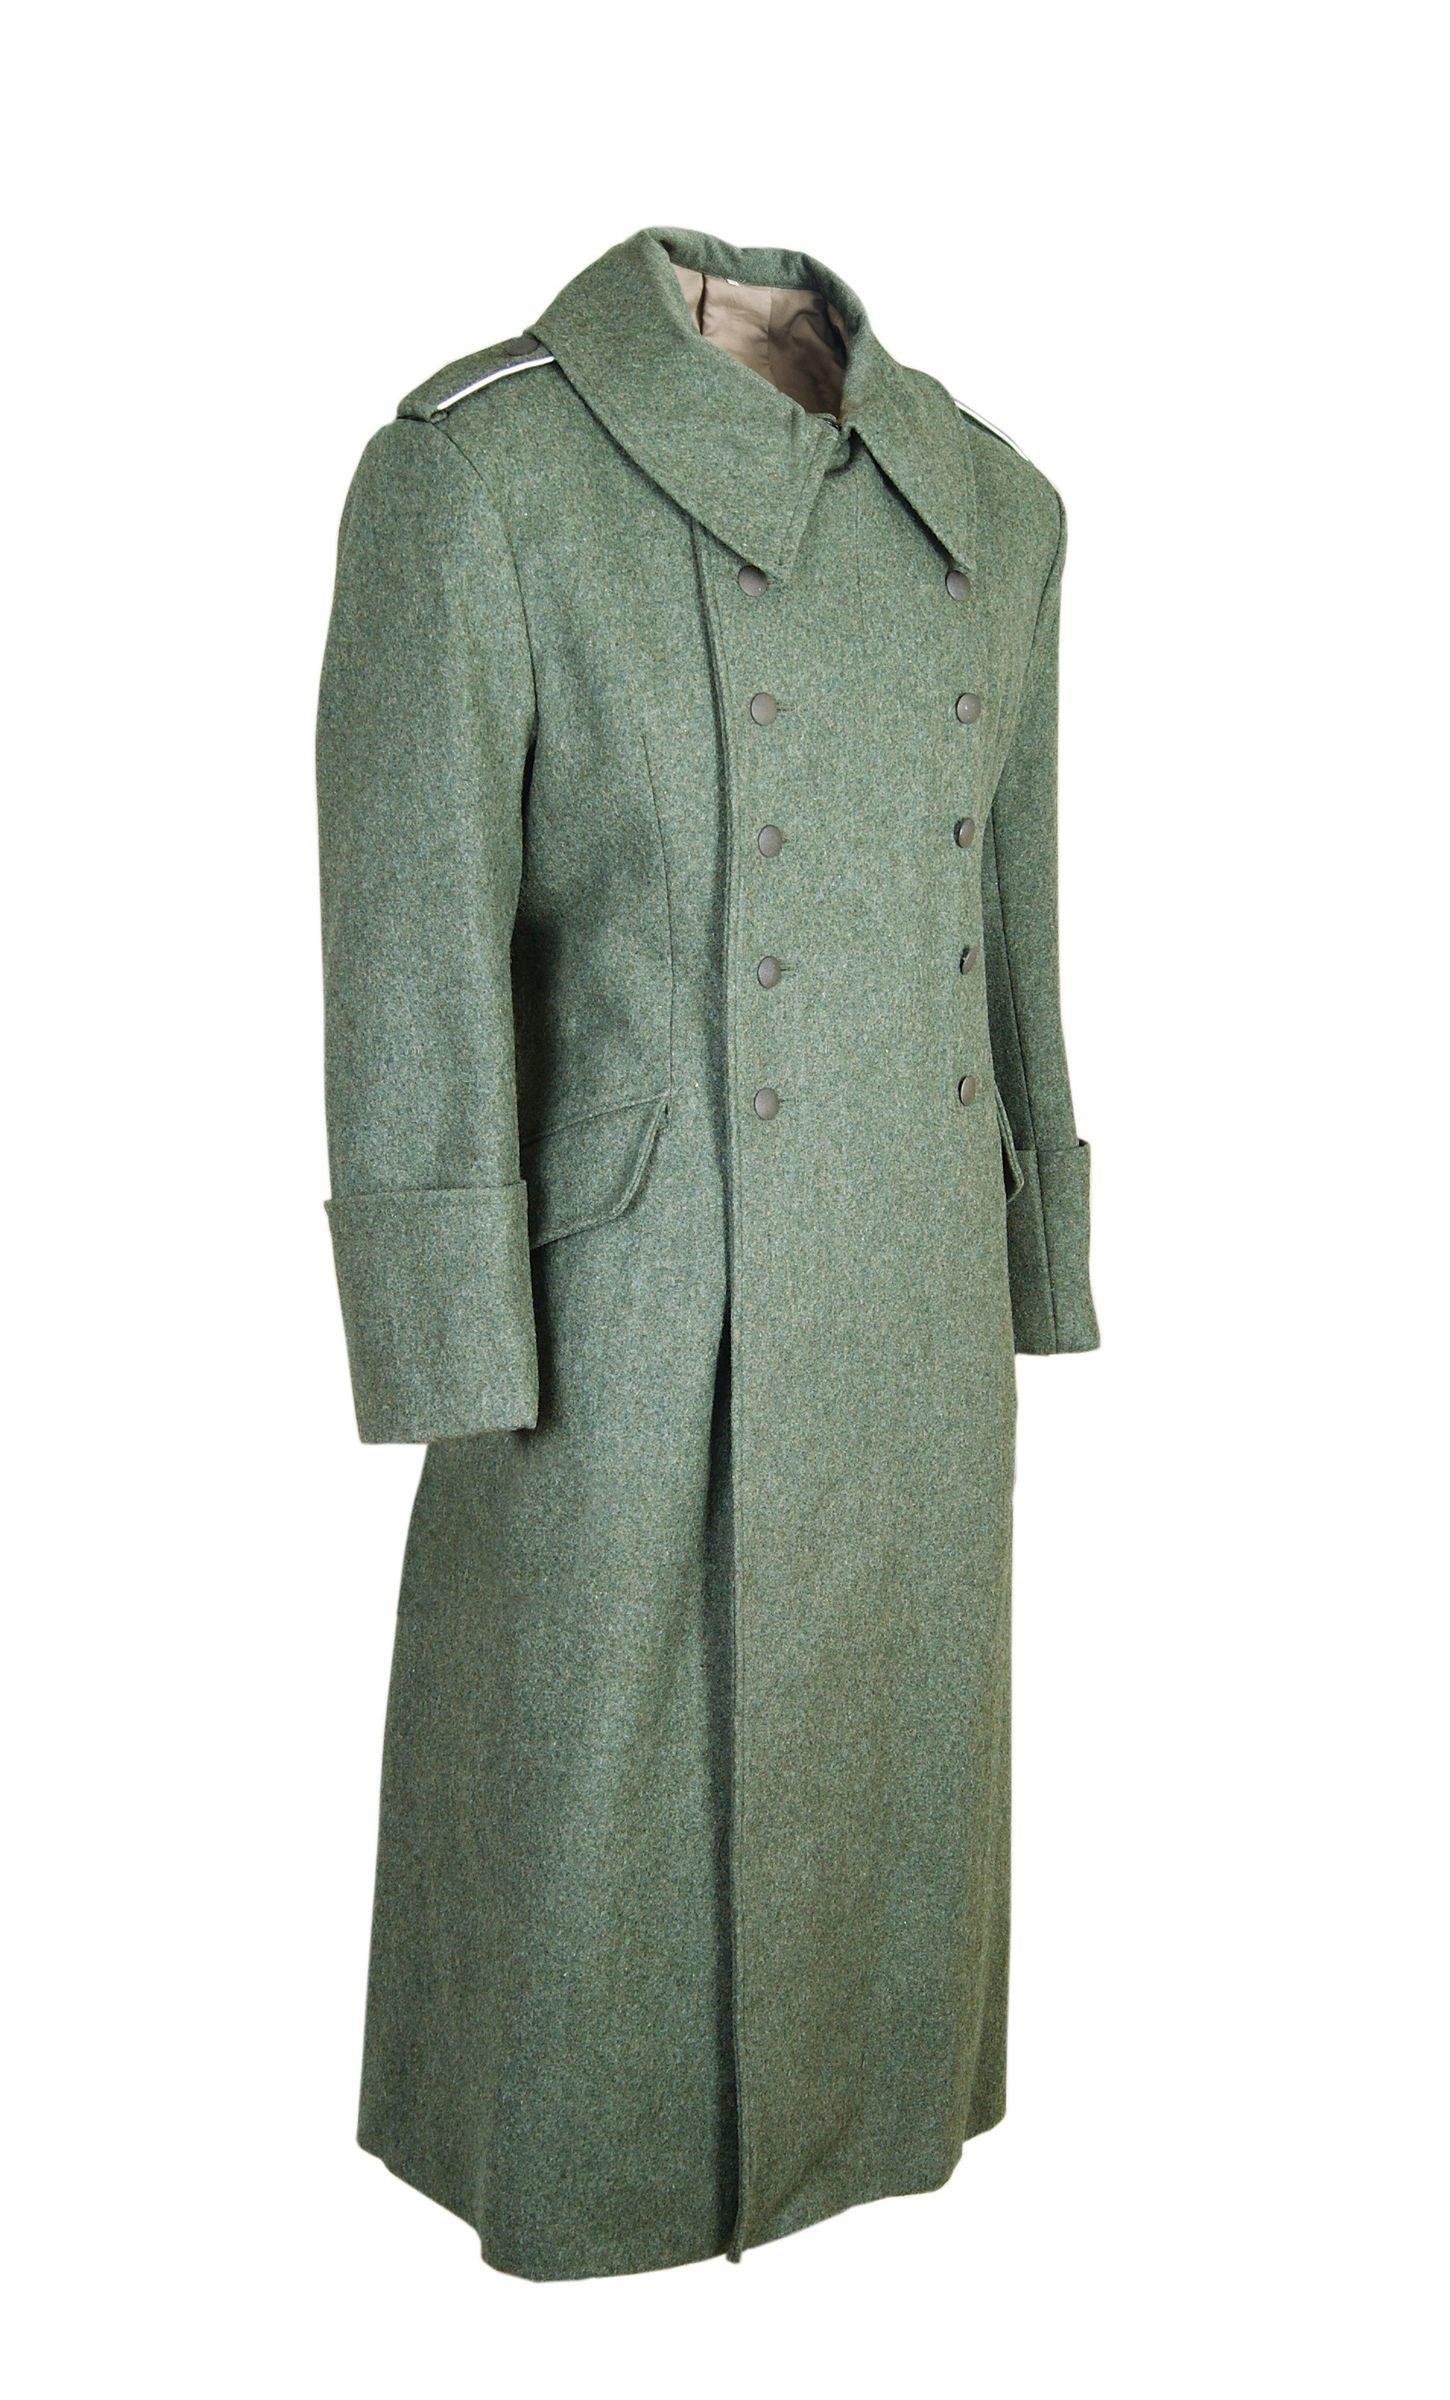 M42 Feldmantel - WH/SS greatcoat - repro